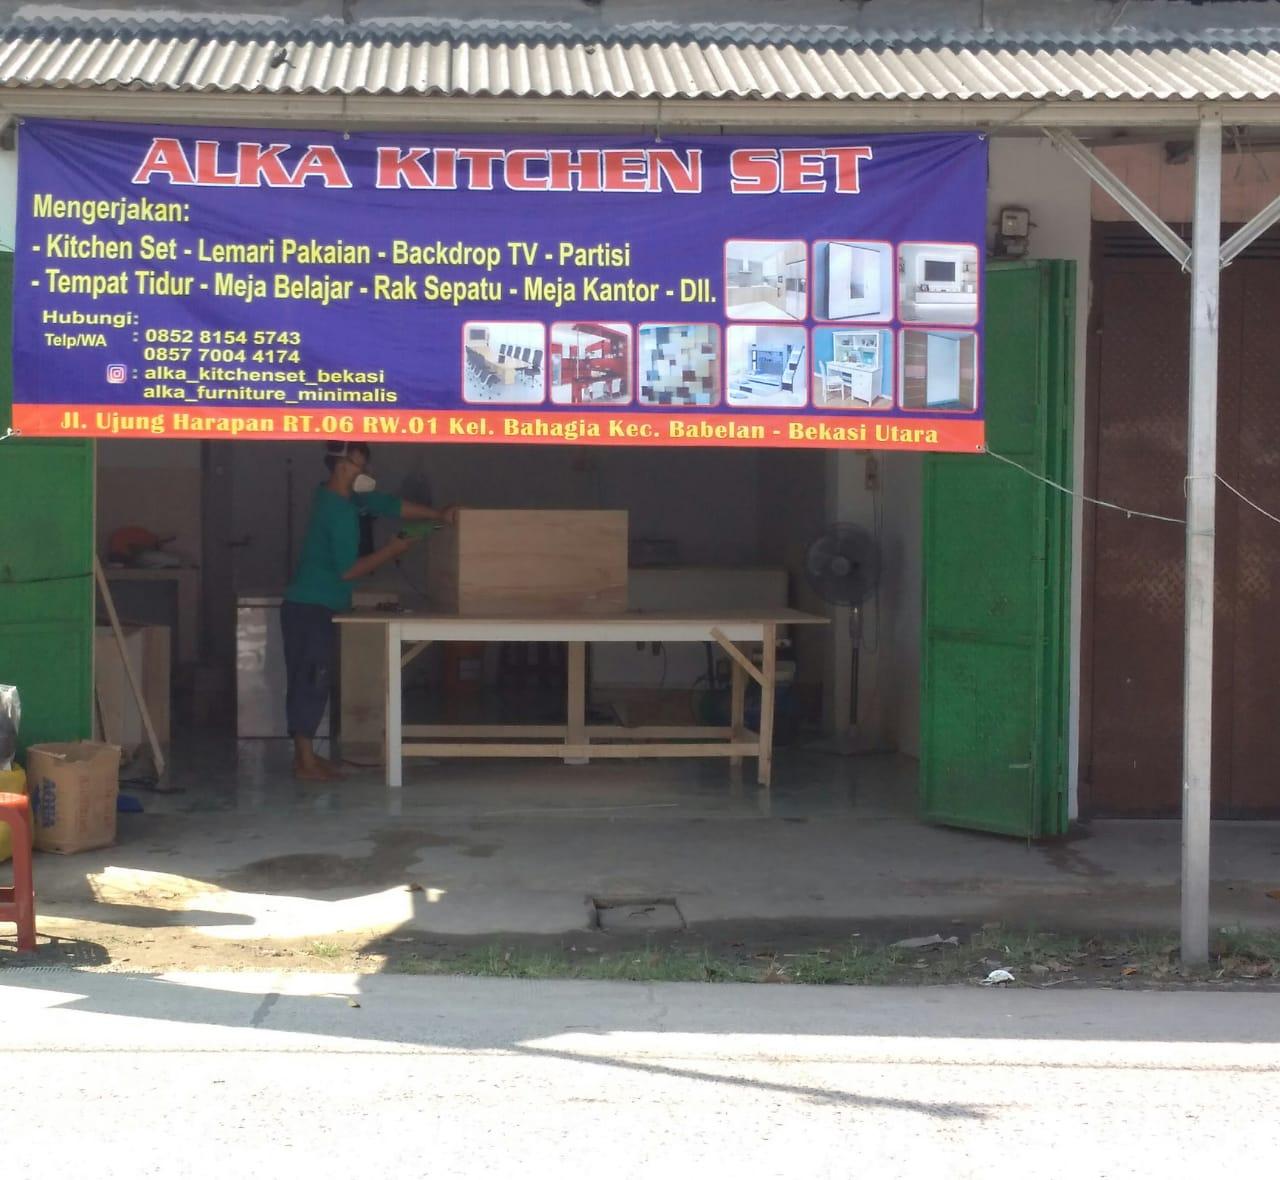 alka kitchen set bekasi - Meja Mesin Jahit Custom